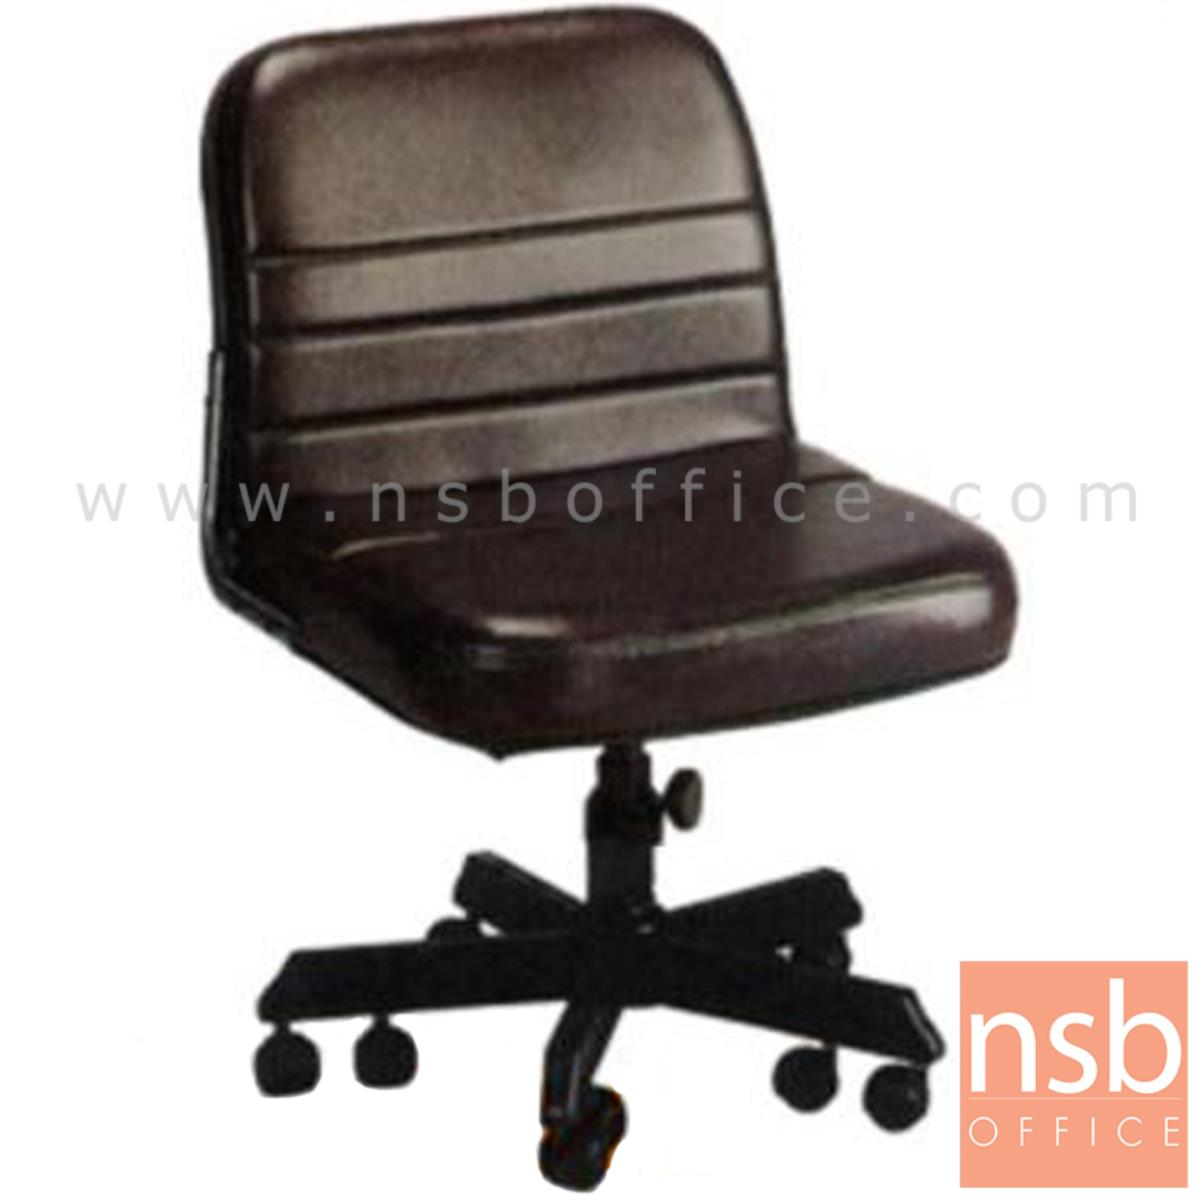 B14A017:เก้าอี้สำนักงาน รุ่น Cardarople  ขาเหล็ก 10 ล้อ